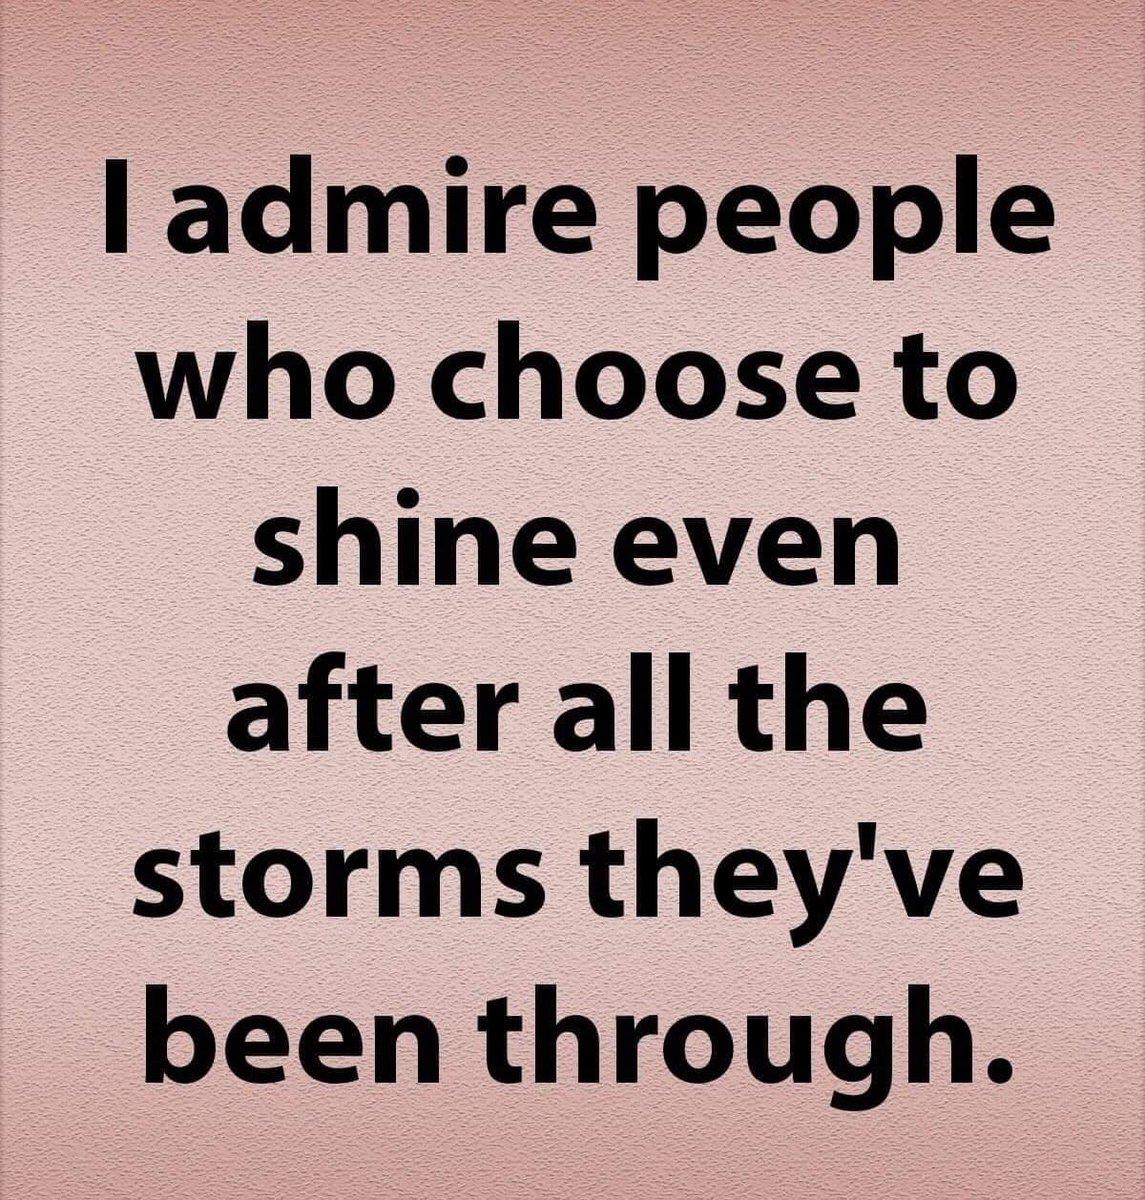 👉🏽#Word! Let's #bring on the #sunshine! ✨☀️✨#KeepTheSunnysideUp!#Pure #Wisdom! #WisdomWednesday #WednesdayThoughts #WednesdayMotivation #WednesdayWidsom #haveaniceday! 😃#ShineOn! ✨✨